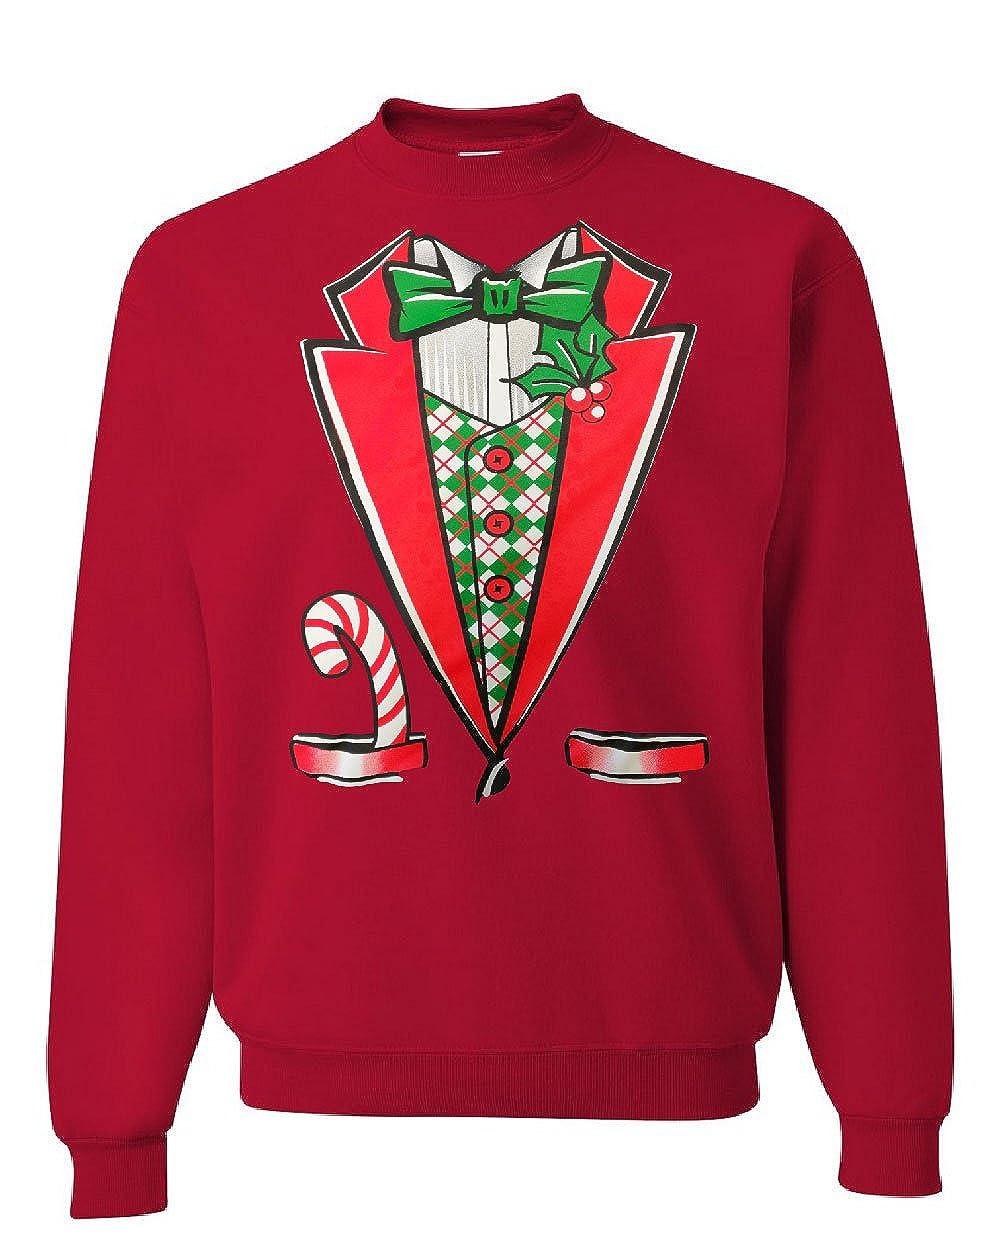 Christmas Tuxedo Crew Neck Sweatshirt Funny Xmas Santa Elf 100606-CS